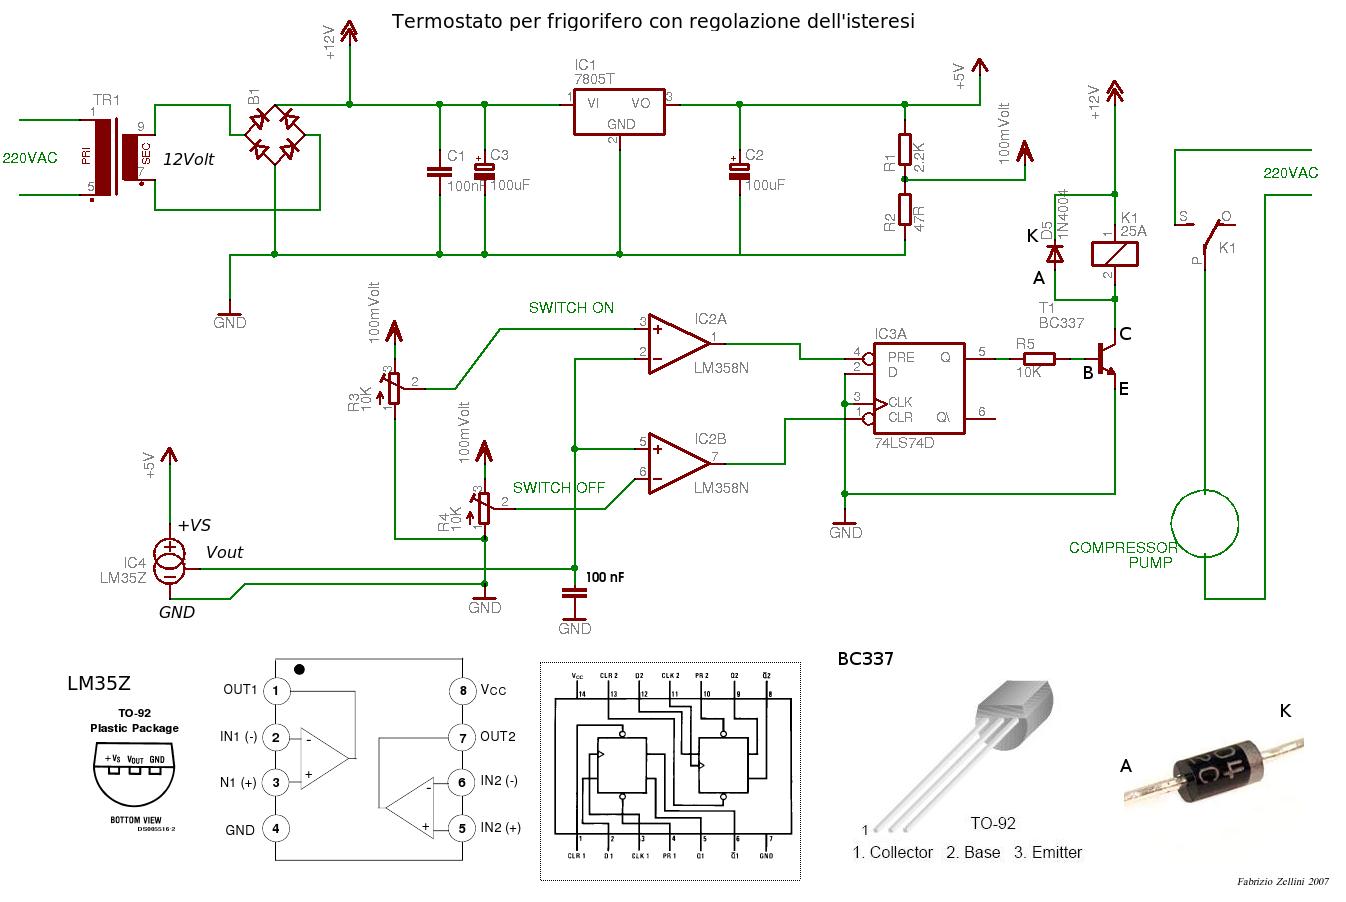 Forno rotor cucina frigoriferi temperatura - Temperatura frigo casa ...